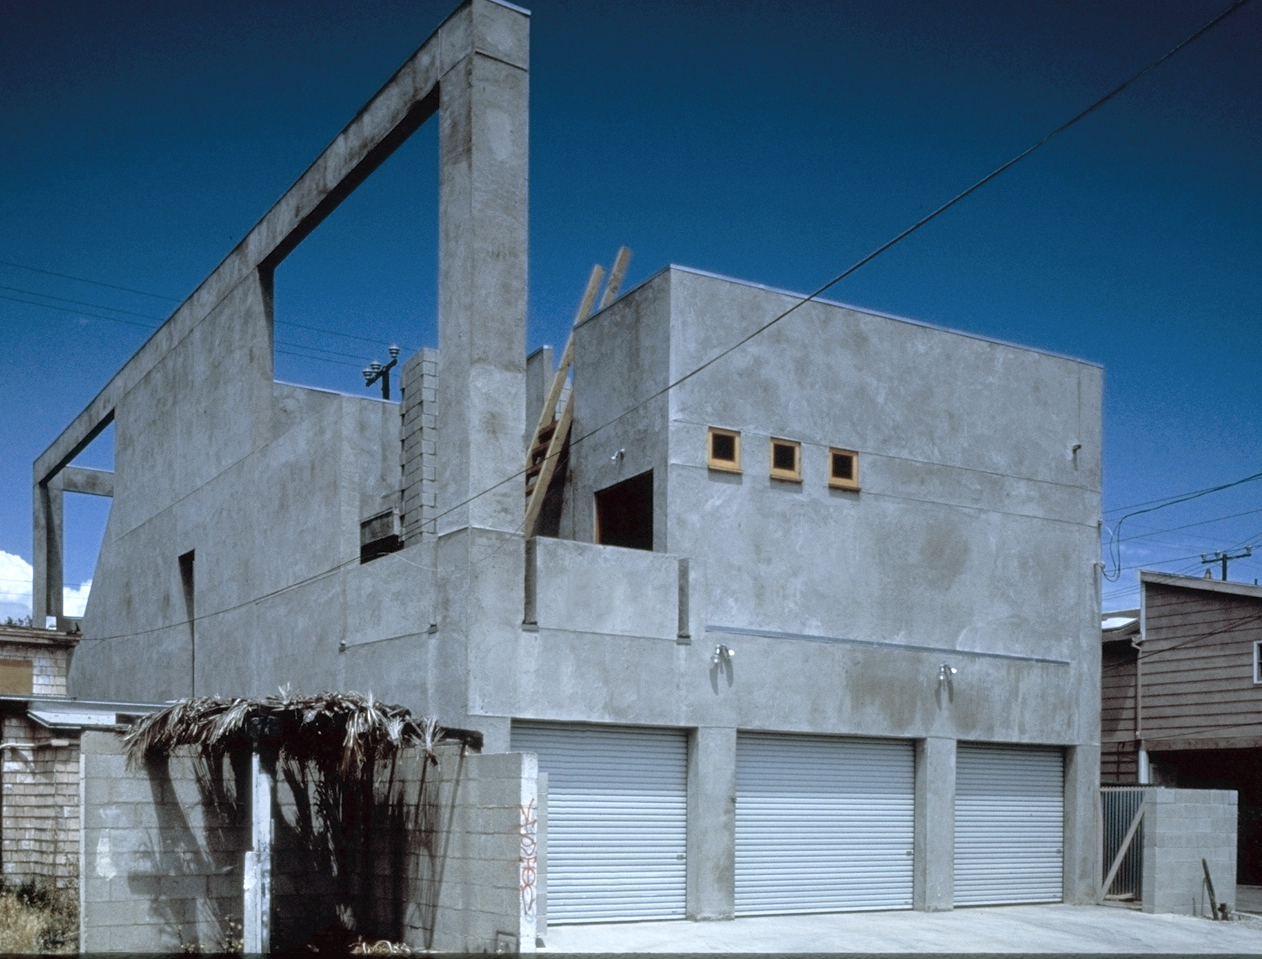 S.E.A.-Studio-Environmental-Architecture-David-Hertz-FAIA-Venable-House-Venice-Beach-sustainable-regenerative-restorative-design-residential-contemporary-modern-passive-systems-recycled-wood-concrete-green-building-canal-beachhouse-studioea-4.jpg